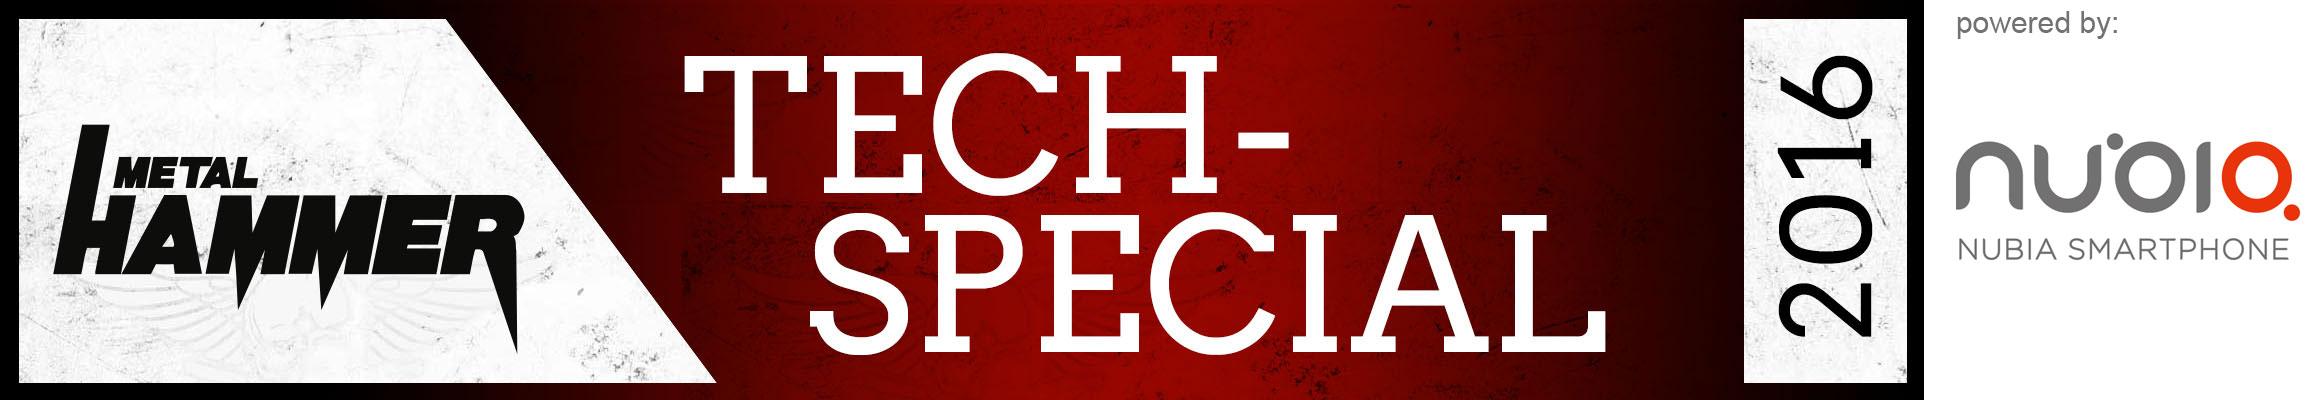 METAL HAMMER Tech-Special 2016